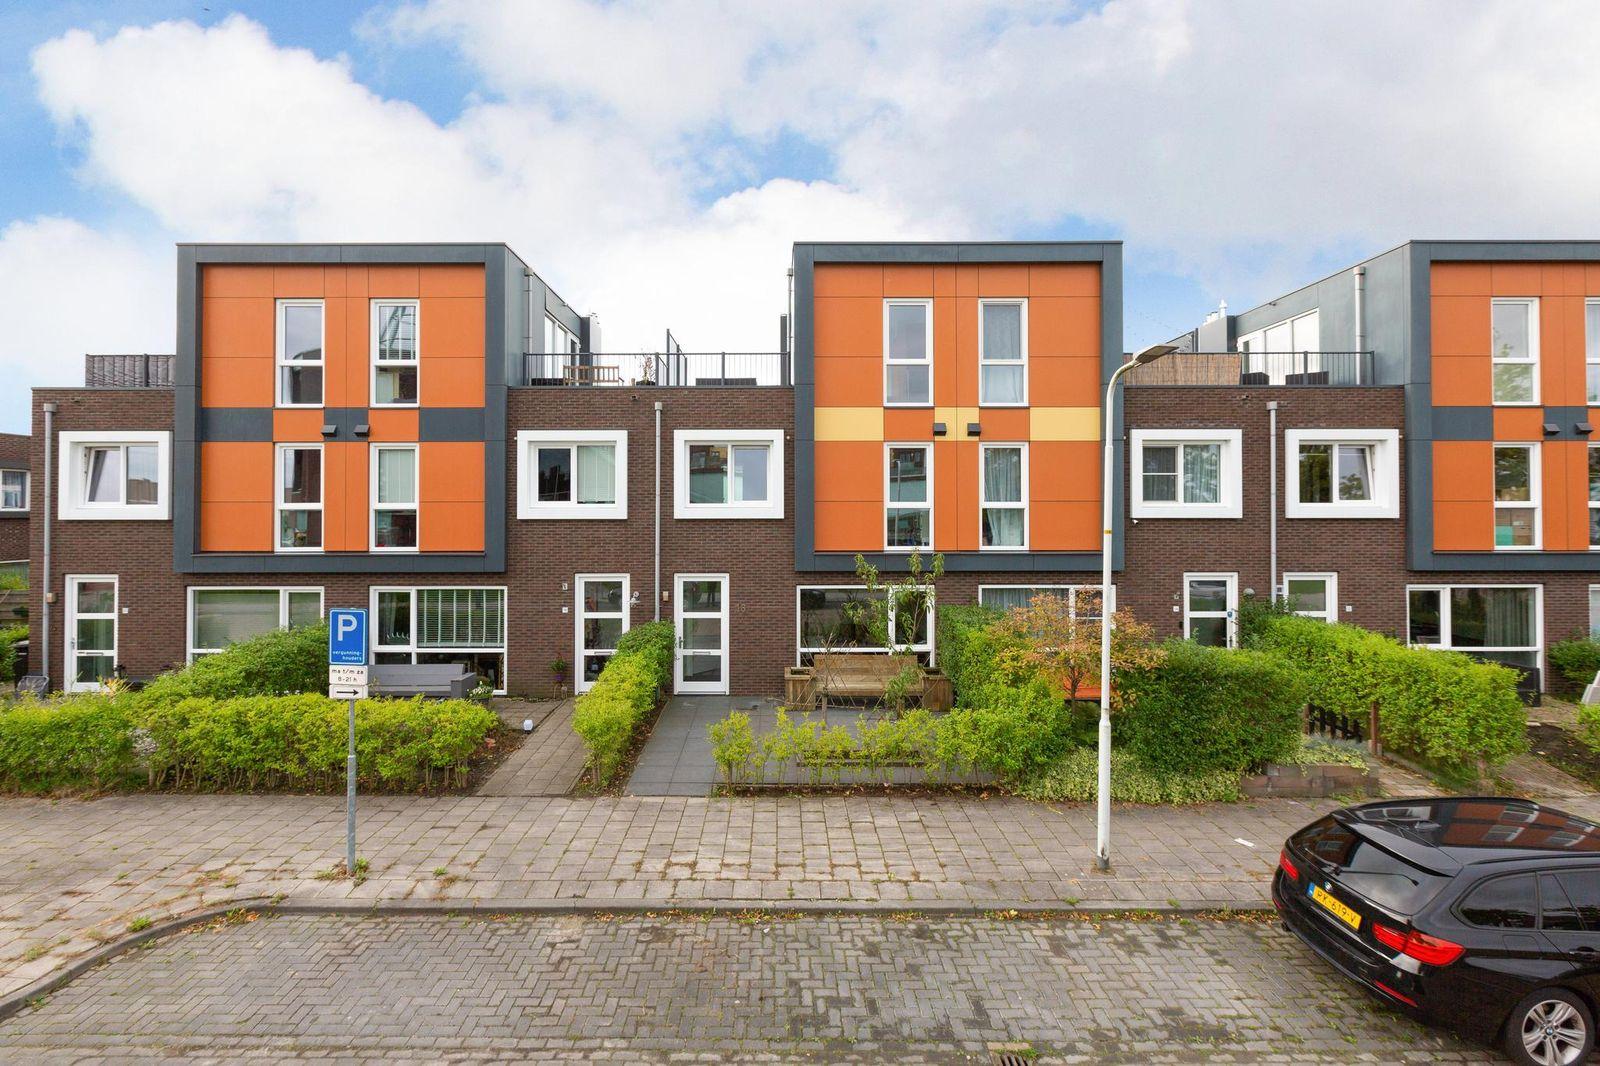 Frieswijkstraat 16, Sneek